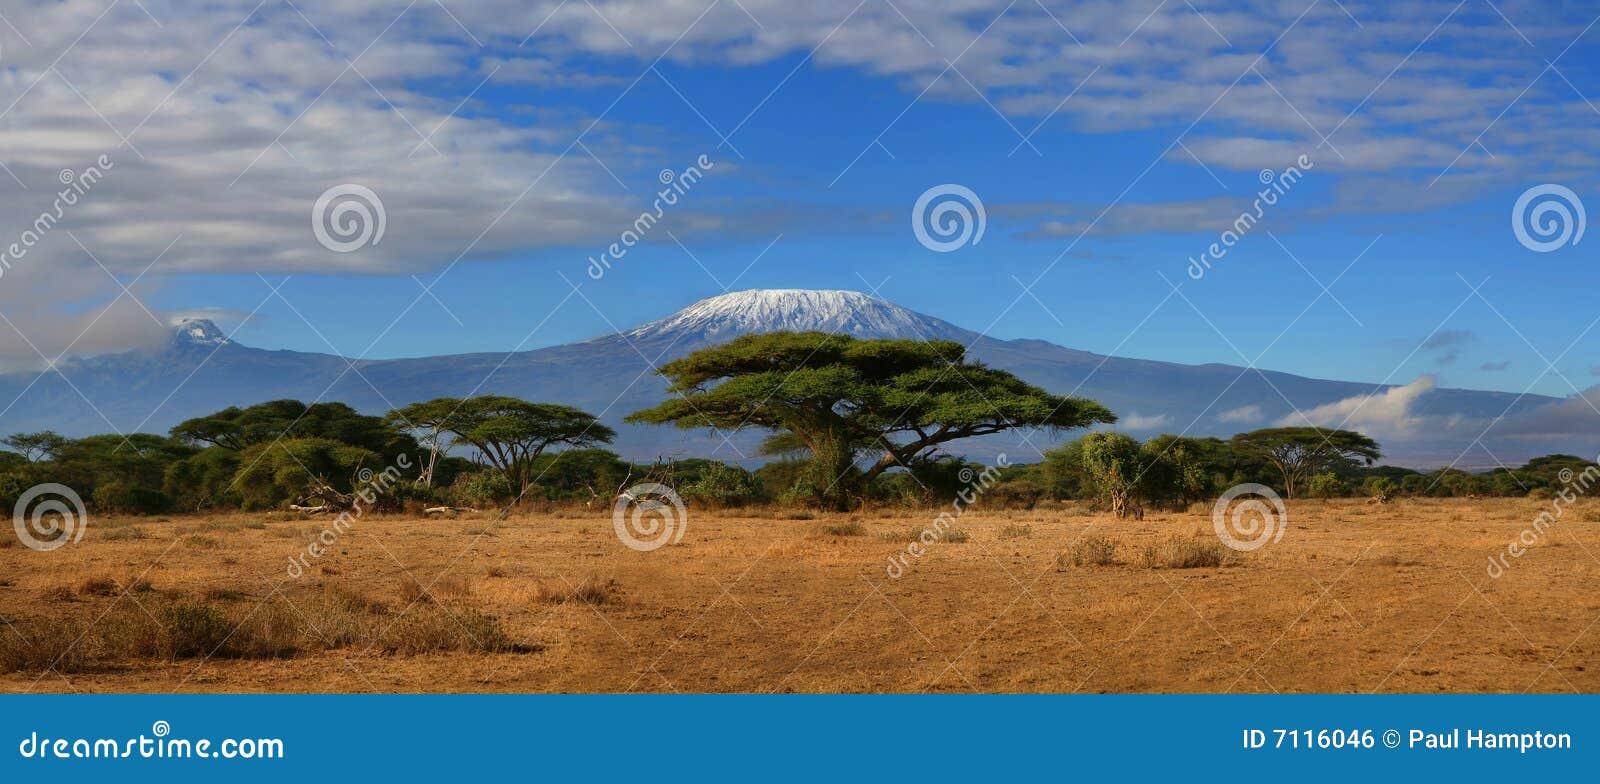 Kilimanjaro weit